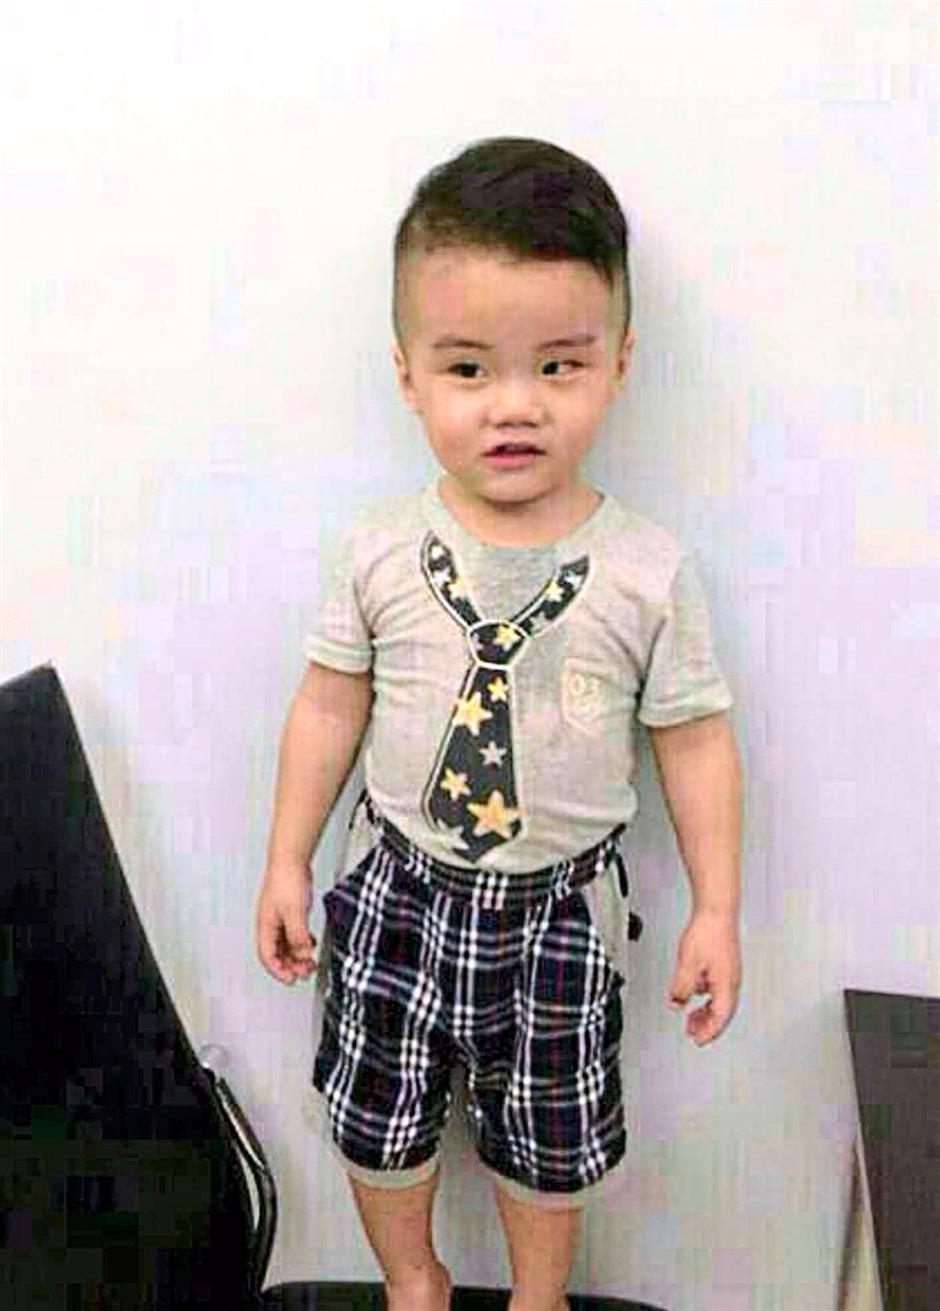 A boy missing after a car hijacking at Kampung Air early morning in Kota Kinabalu yesterday.